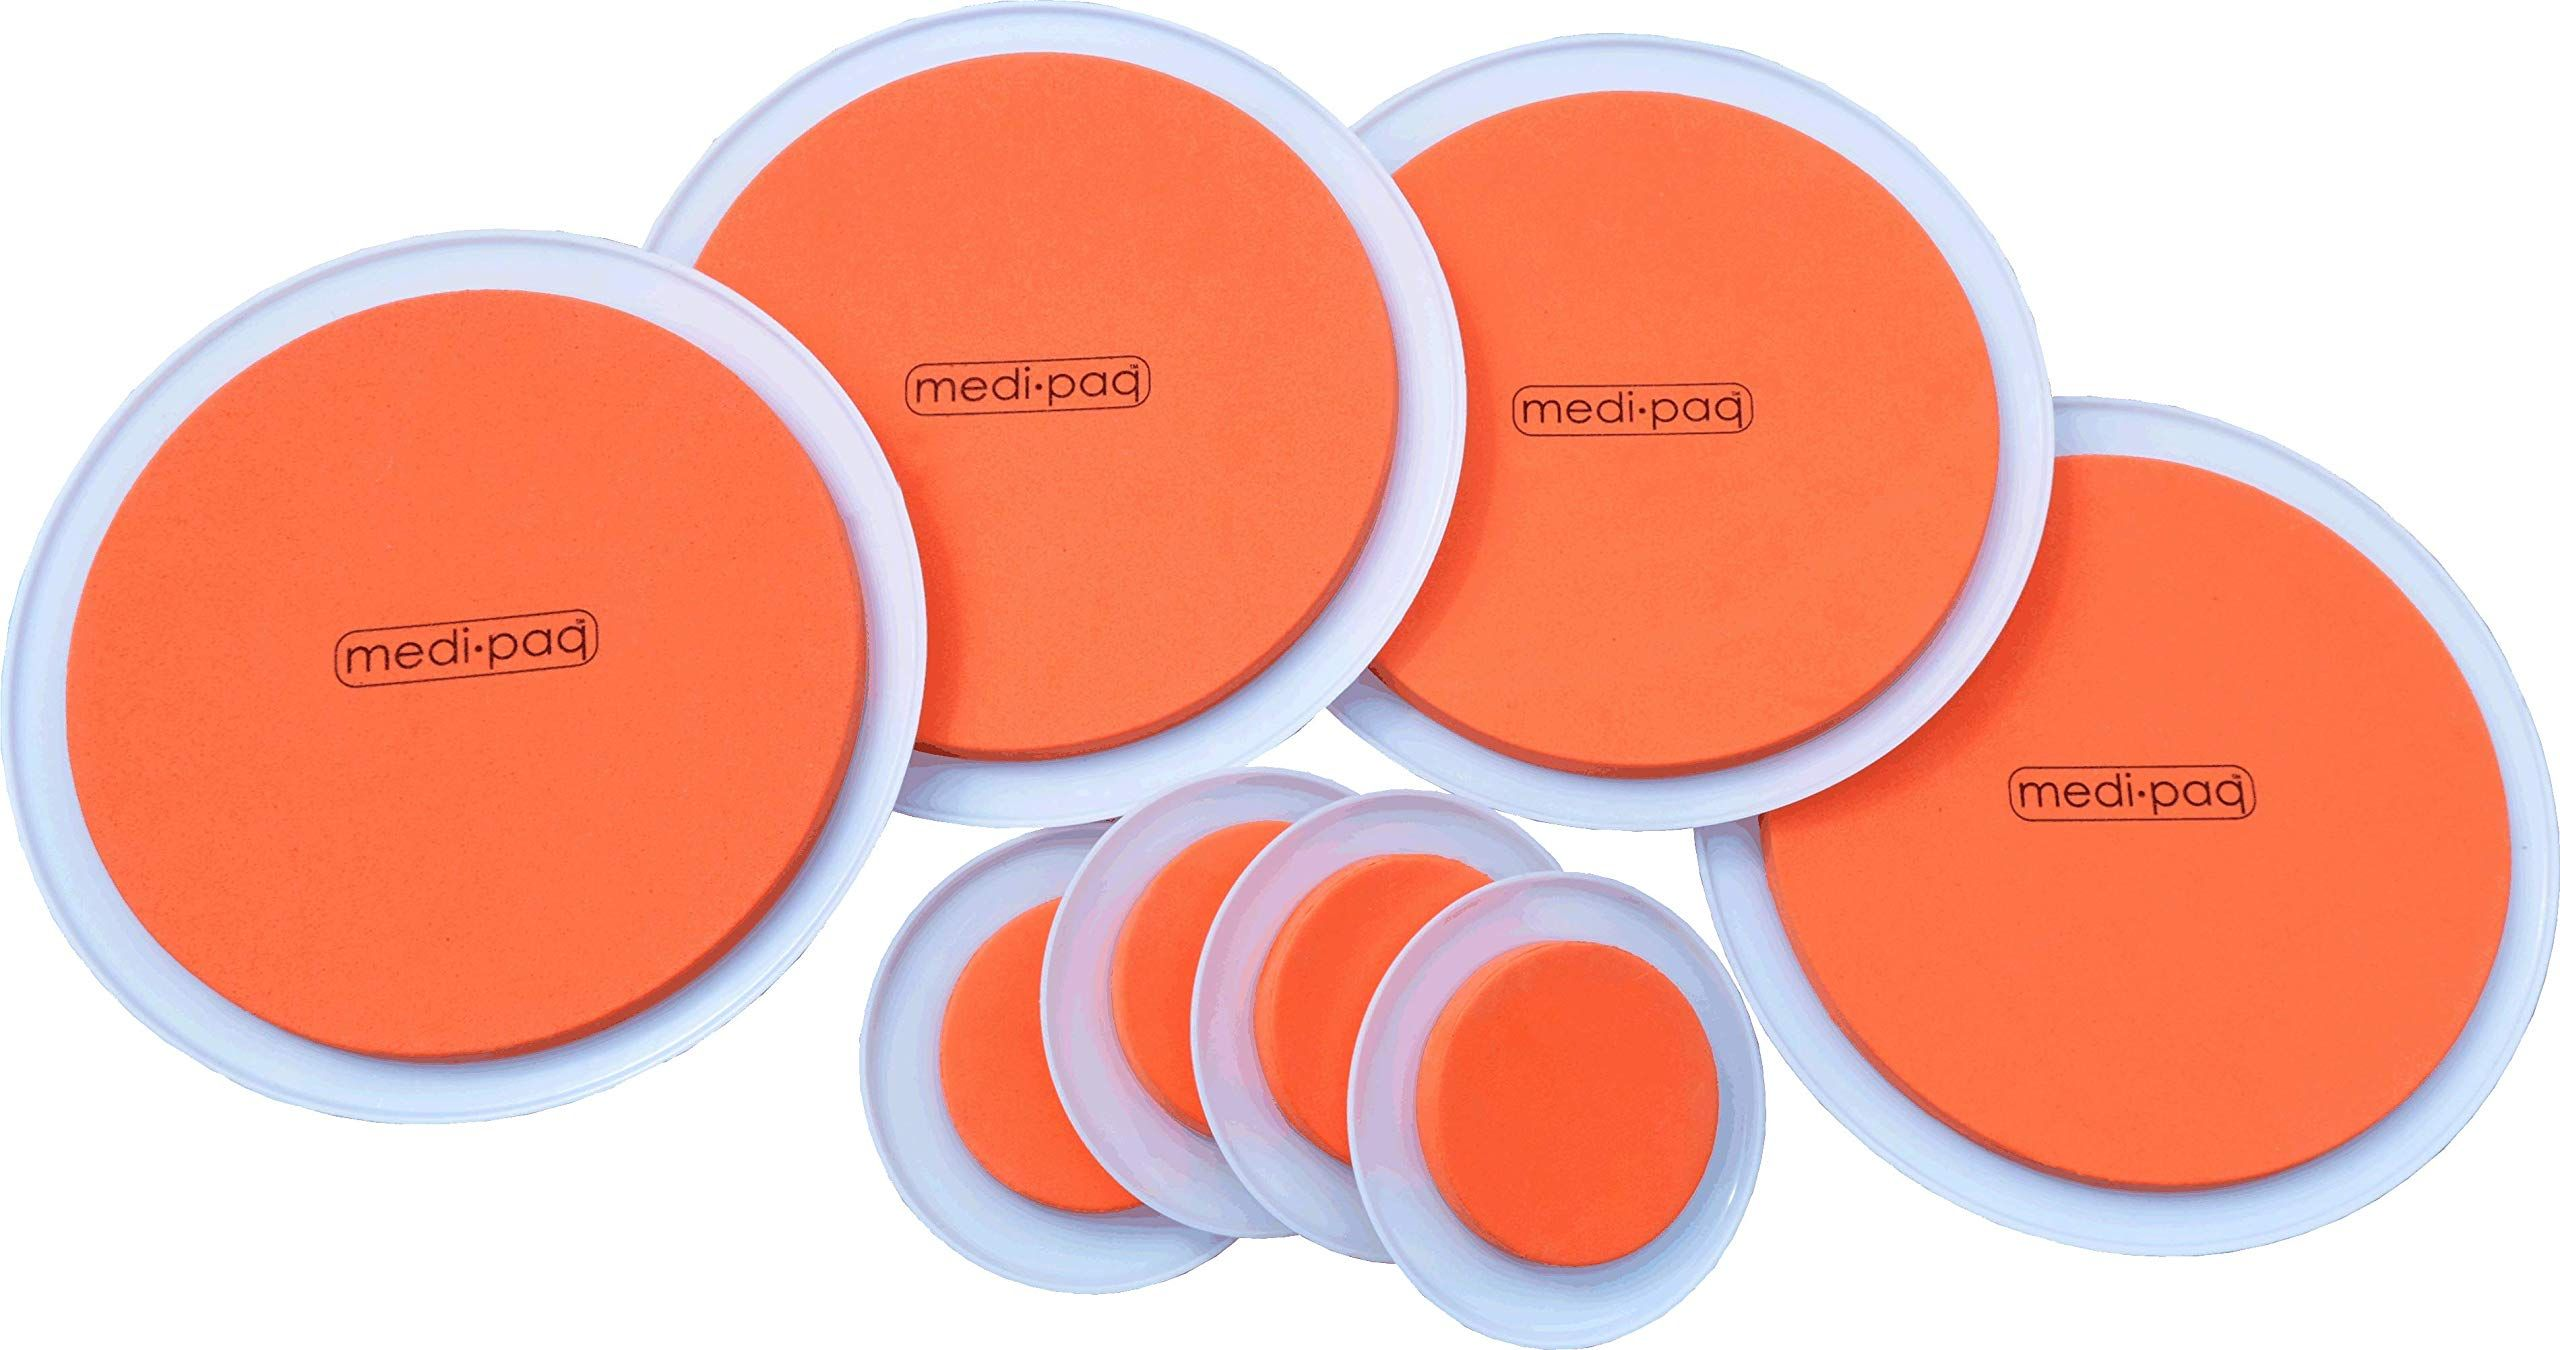 The Super Furniture Sliders Genuine Original Orange Discs By